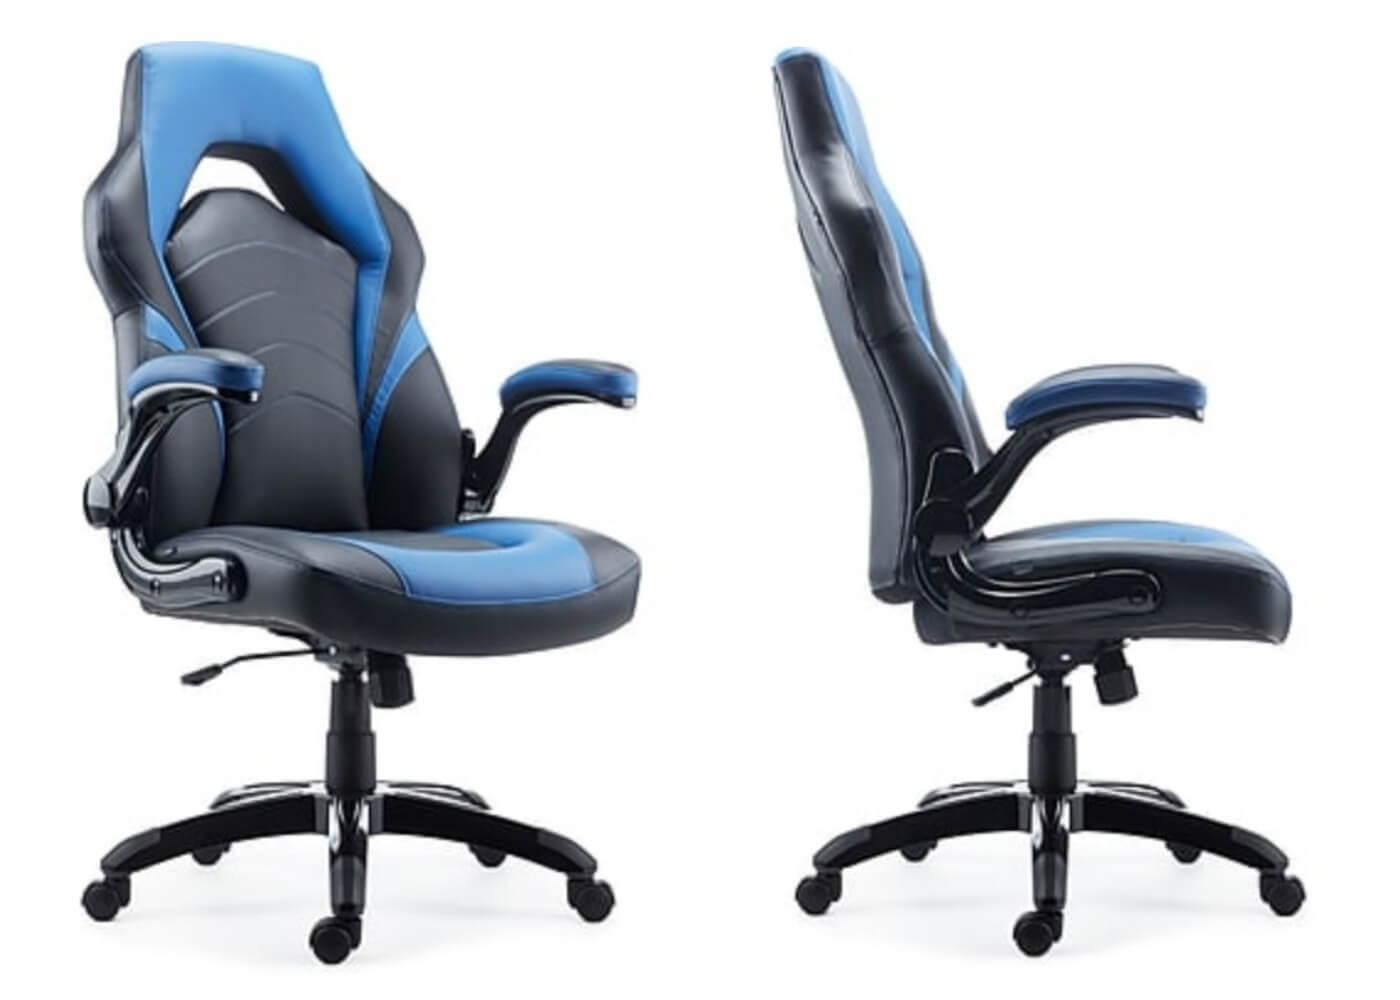 Staples Chair living Gaming Just99Free Shippingorig199 TFJlK1c3